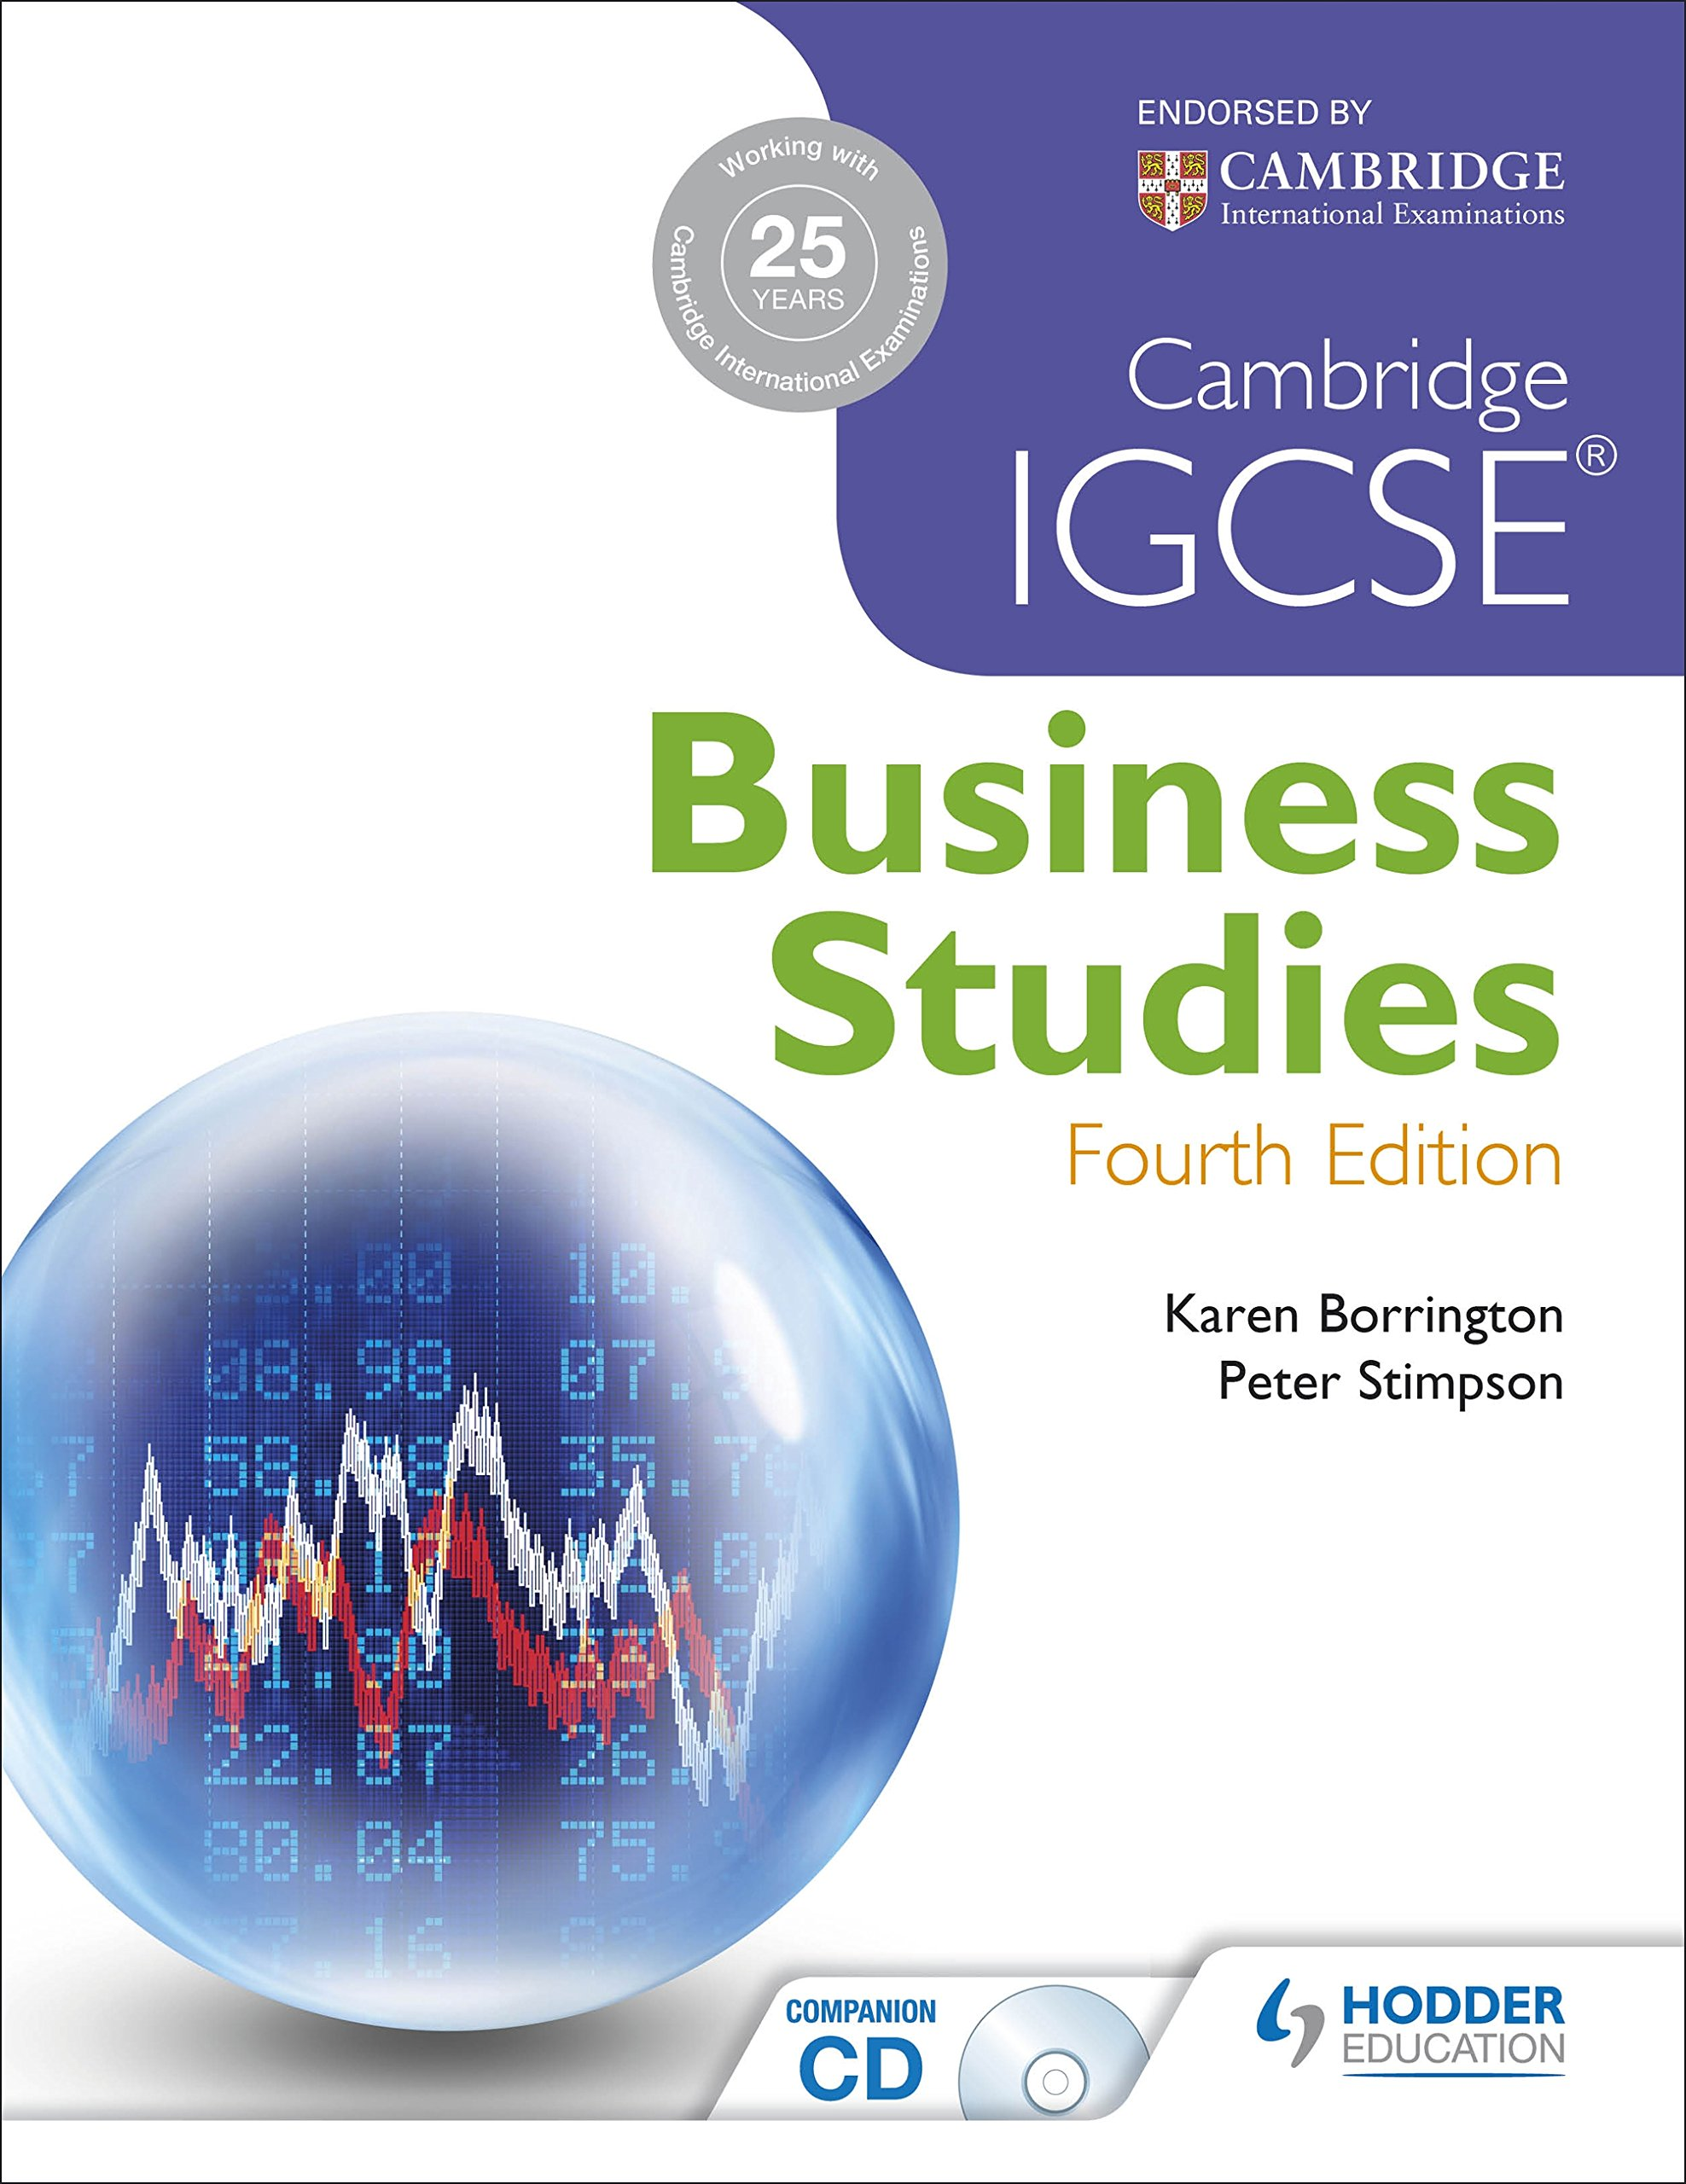 Cambridge IGCSE Business Studies 4th edition: Karen Borrington, Peter  Stimpson: 9781444176582: Amazon.com: Books